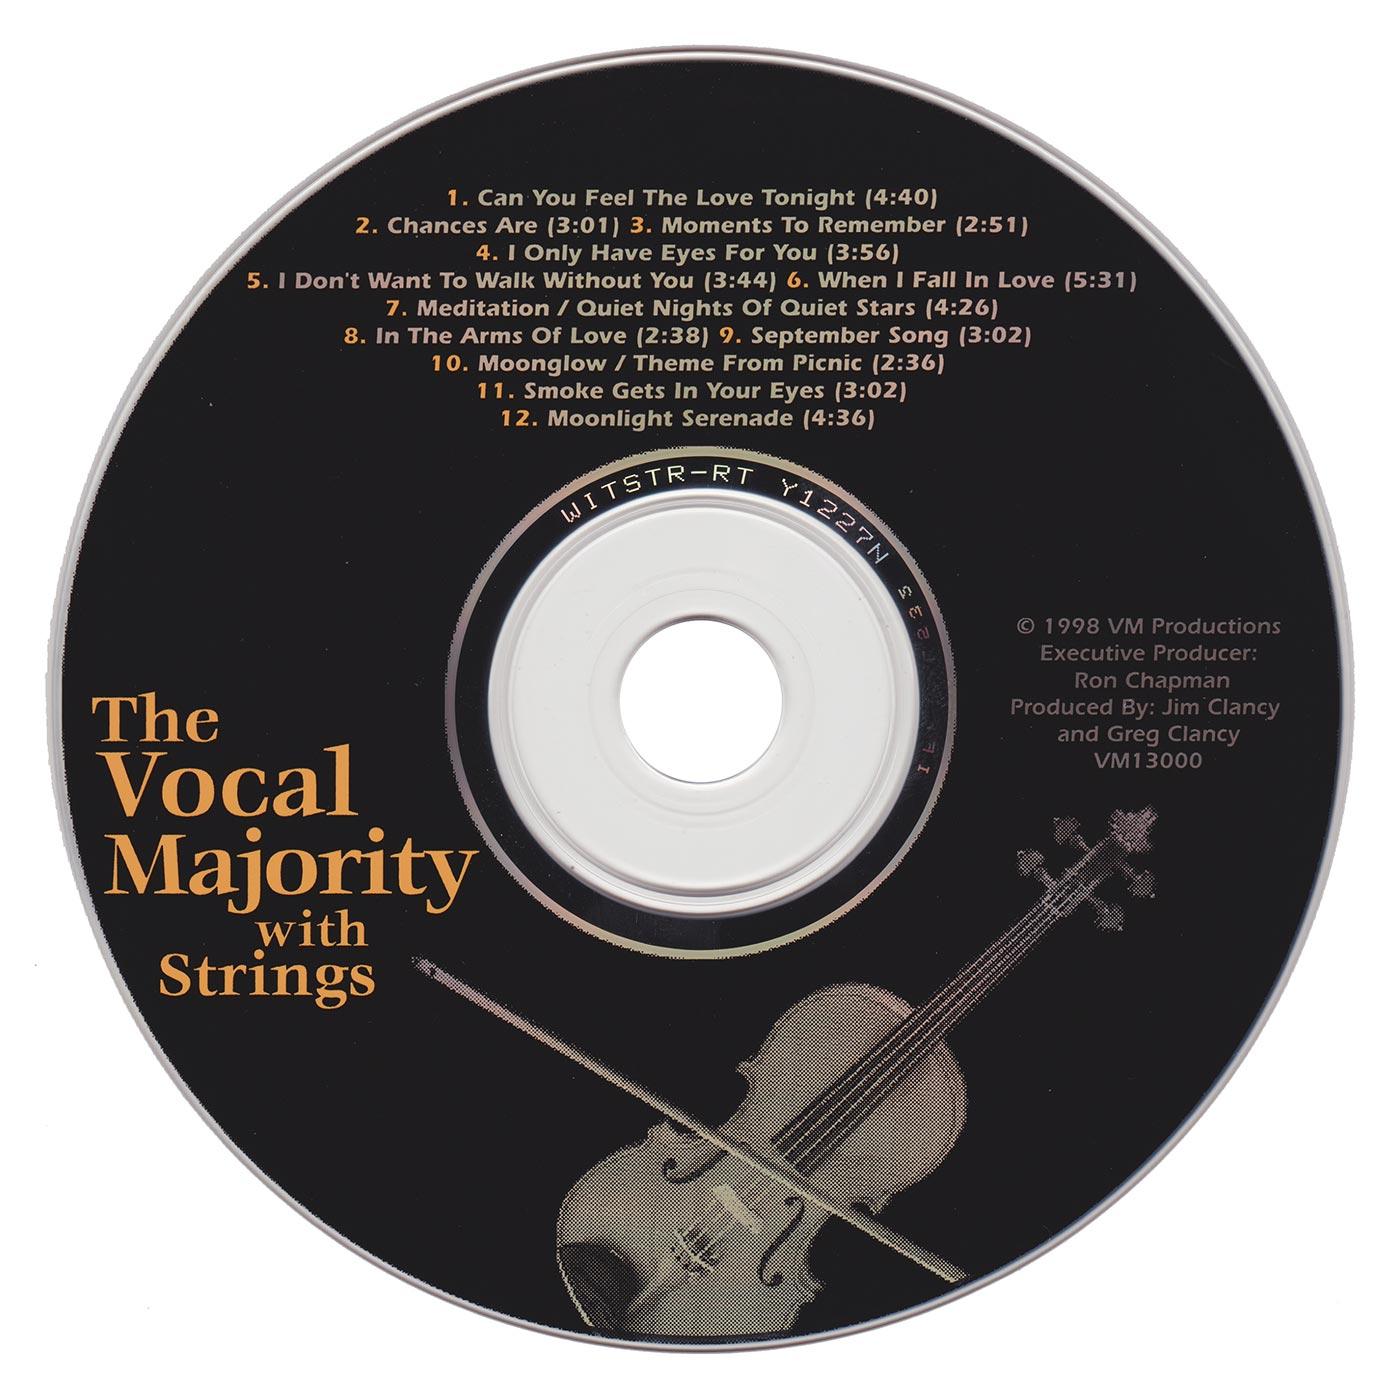 Disc Art: VM with Strings Vol. 1